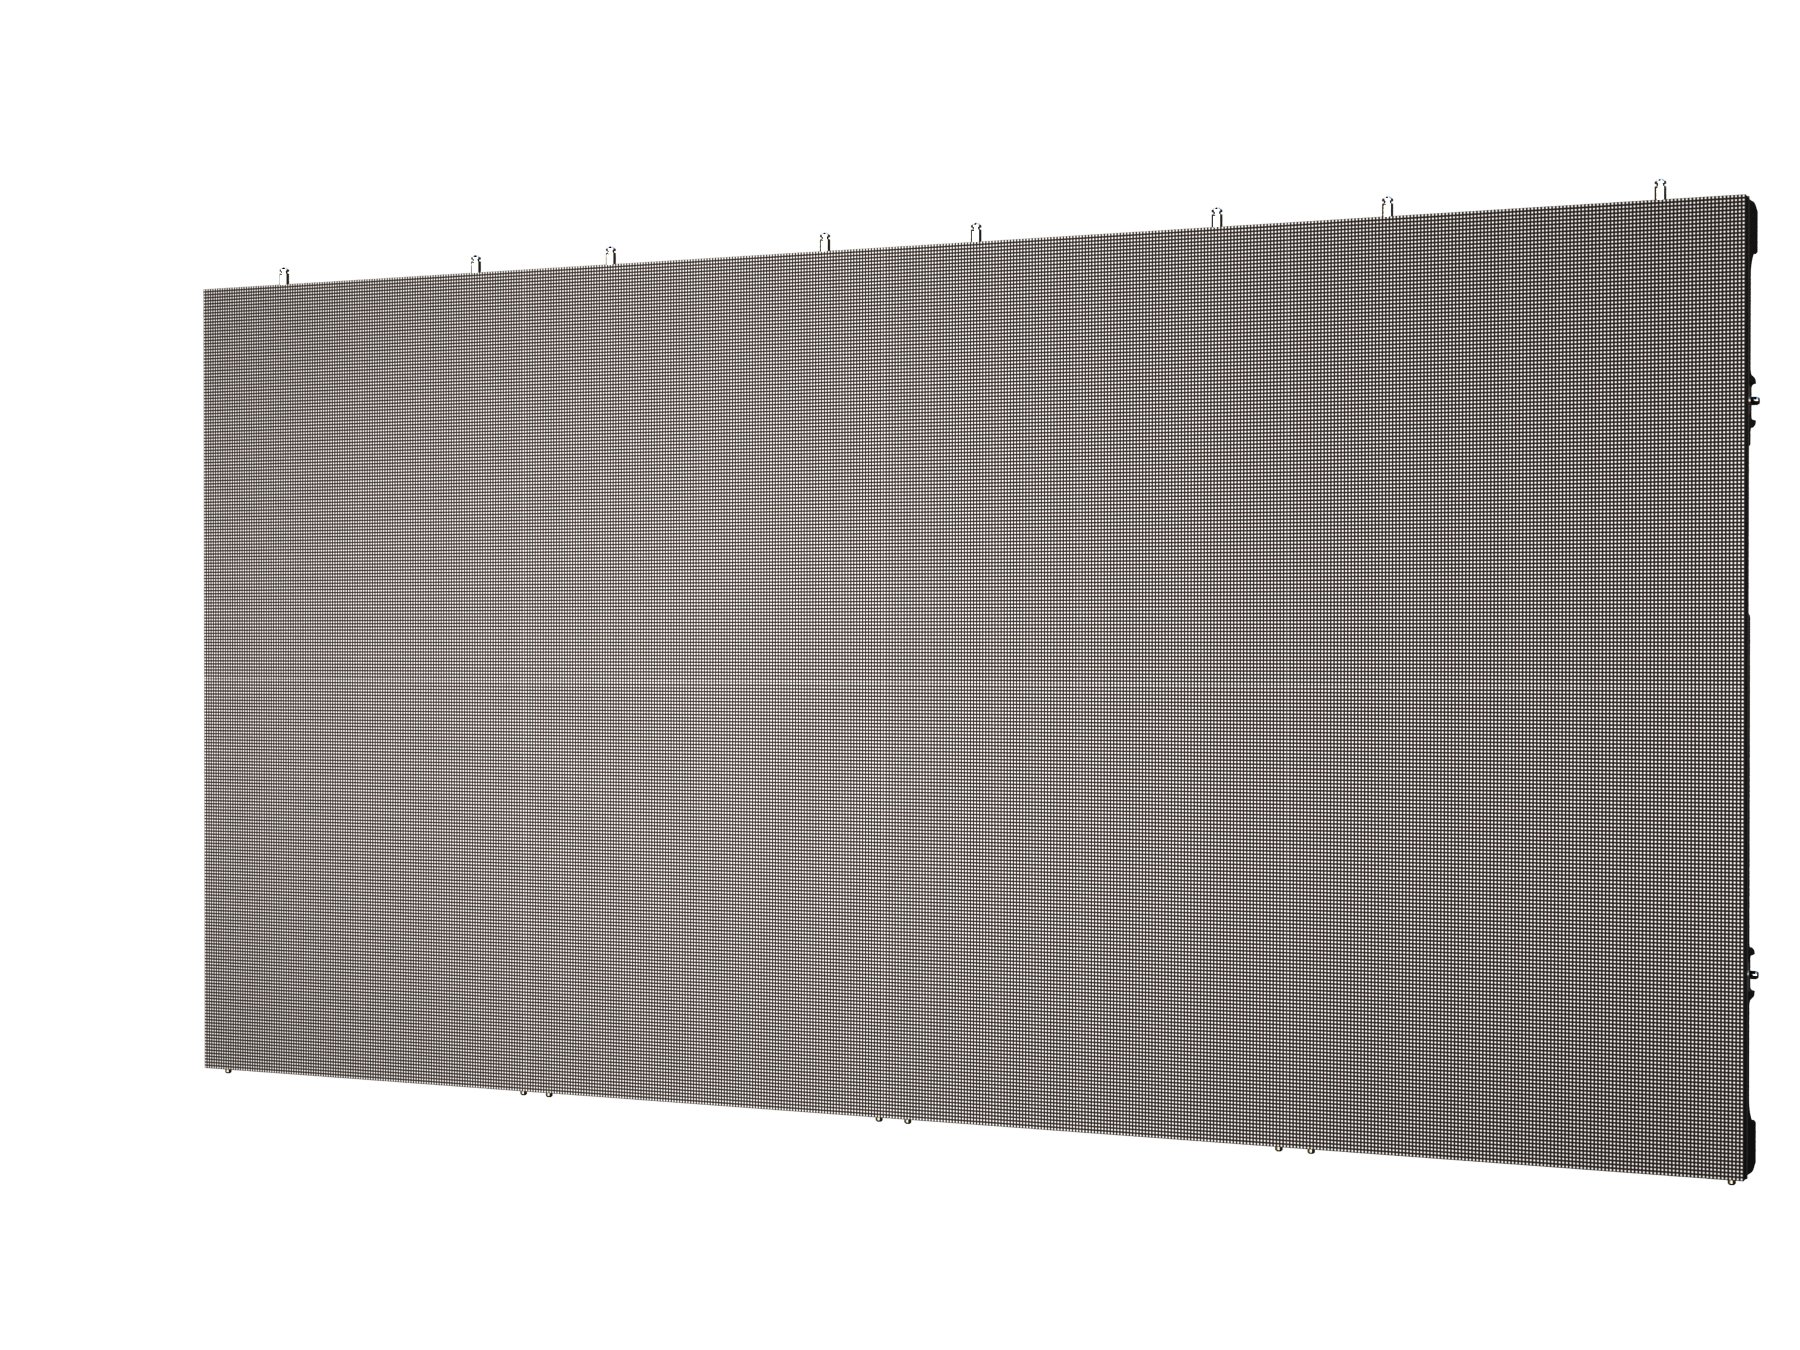 ULS rental LED virtual production 500x1000 rendering 4